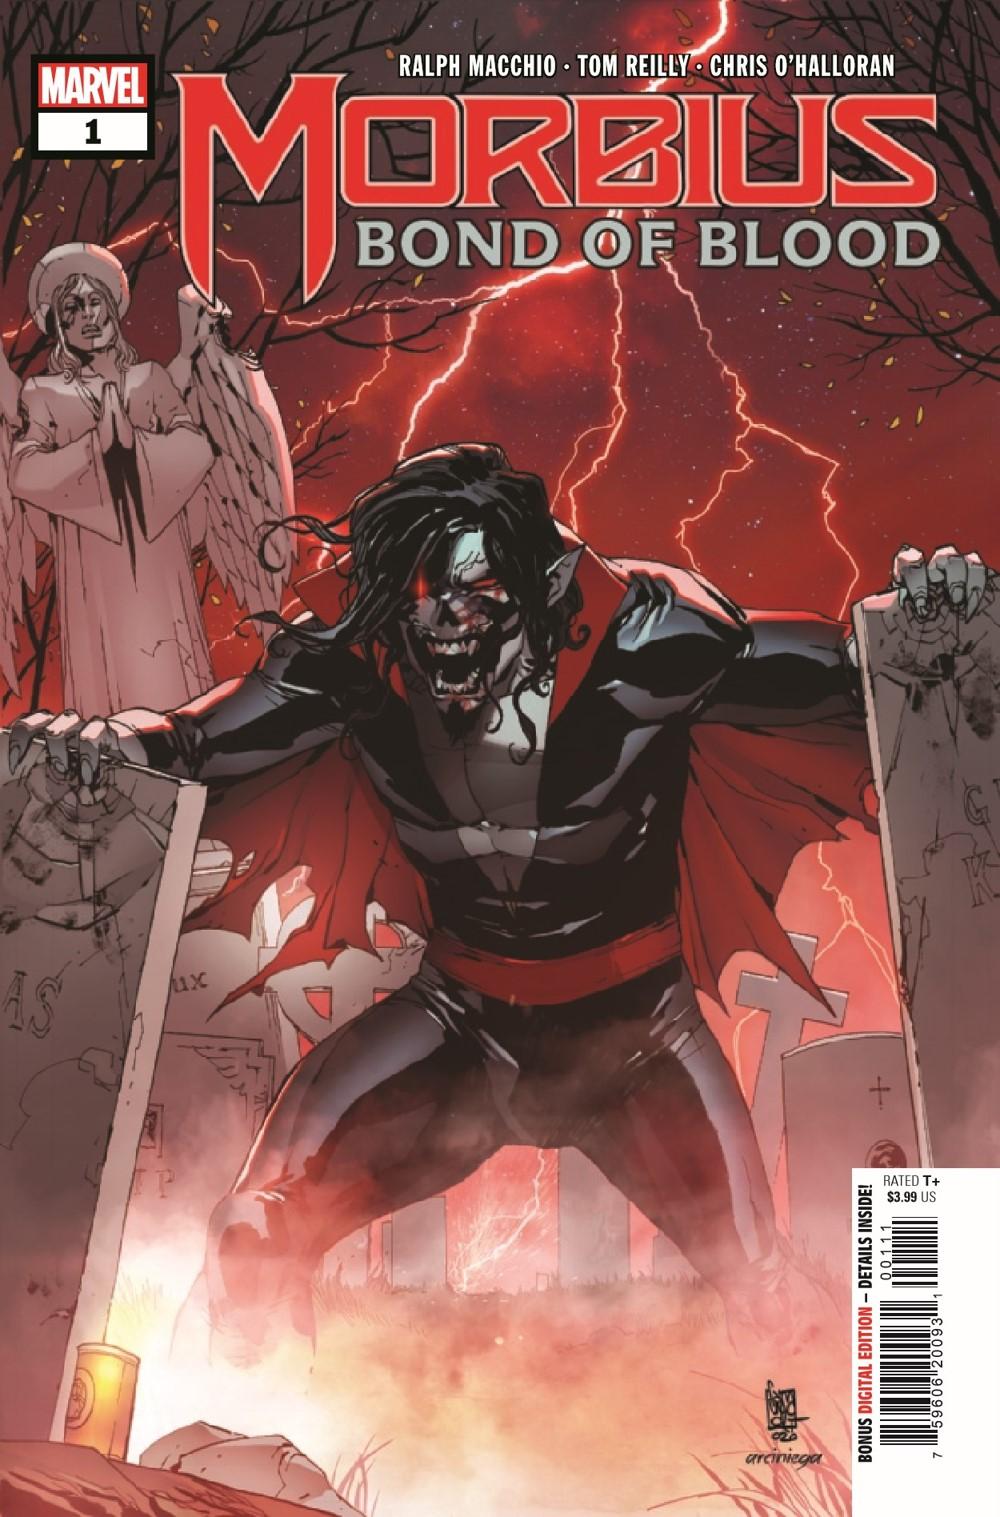 MORBIUSBOB2021001_Preview-1 ComicList Previews: MORBIUS BOND OF BLOOD #1